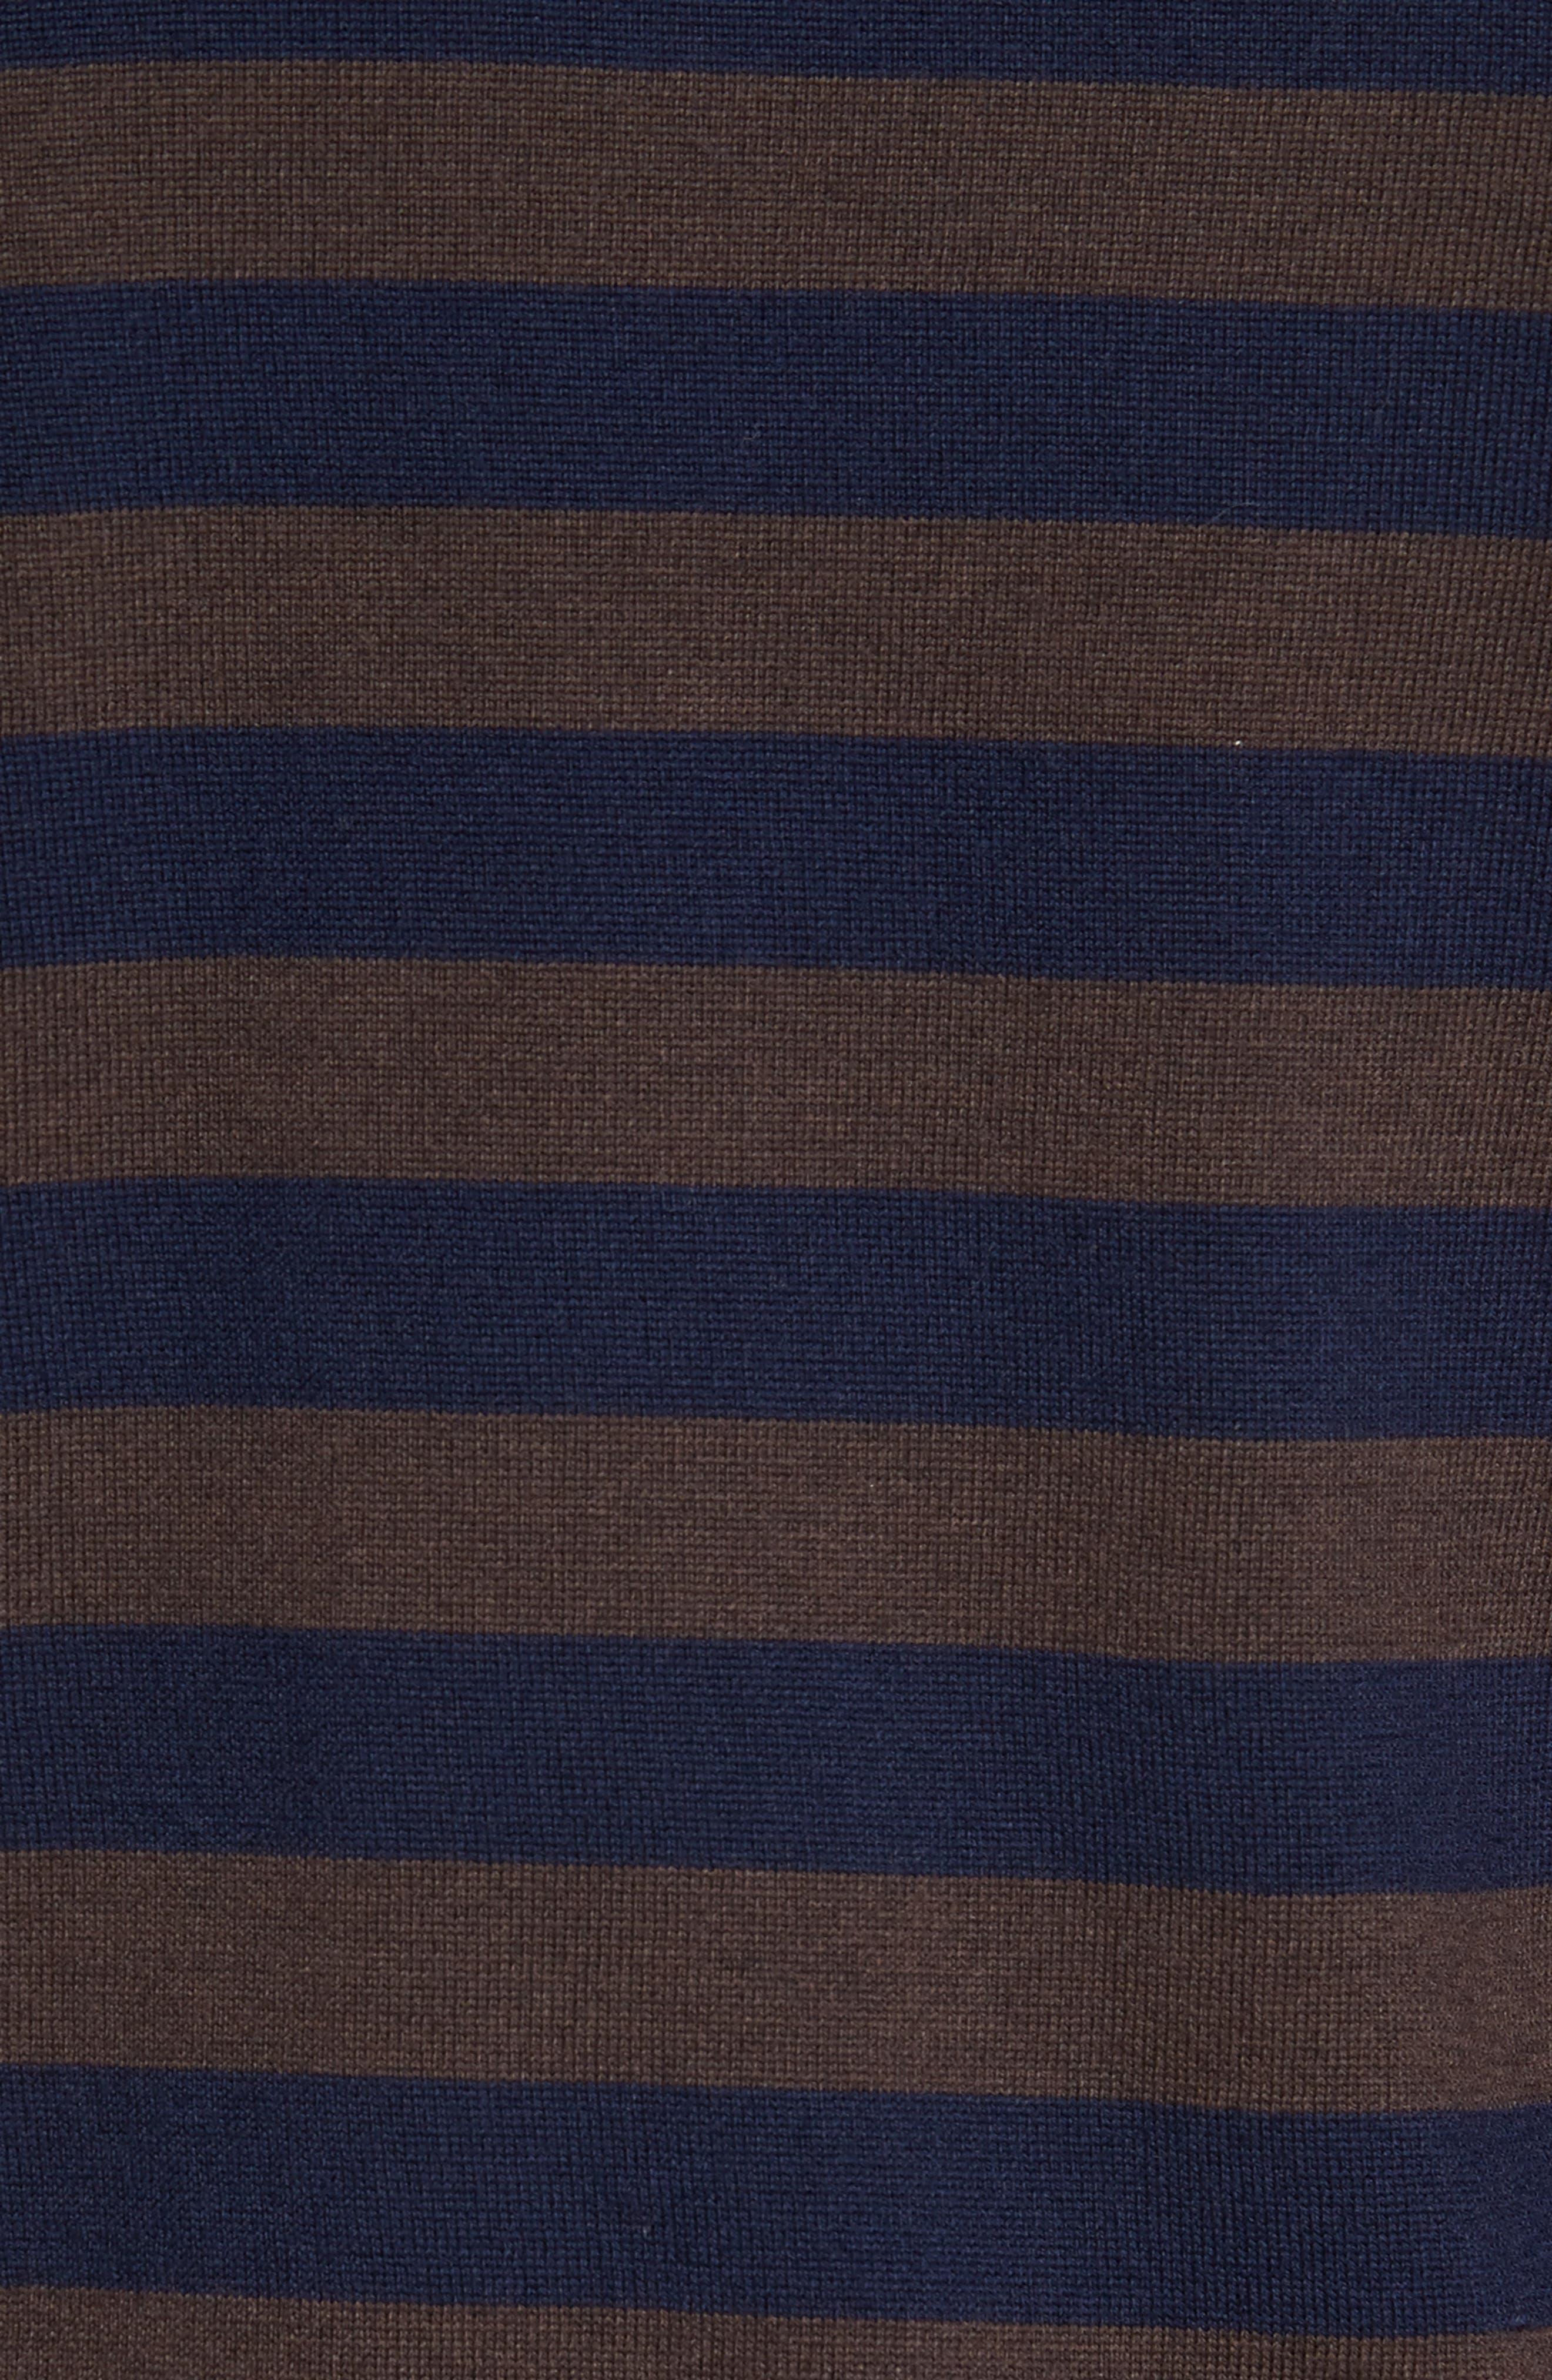 Striped Turtleneck Sweater,                             Alternate thumbnail 5, color,                             204